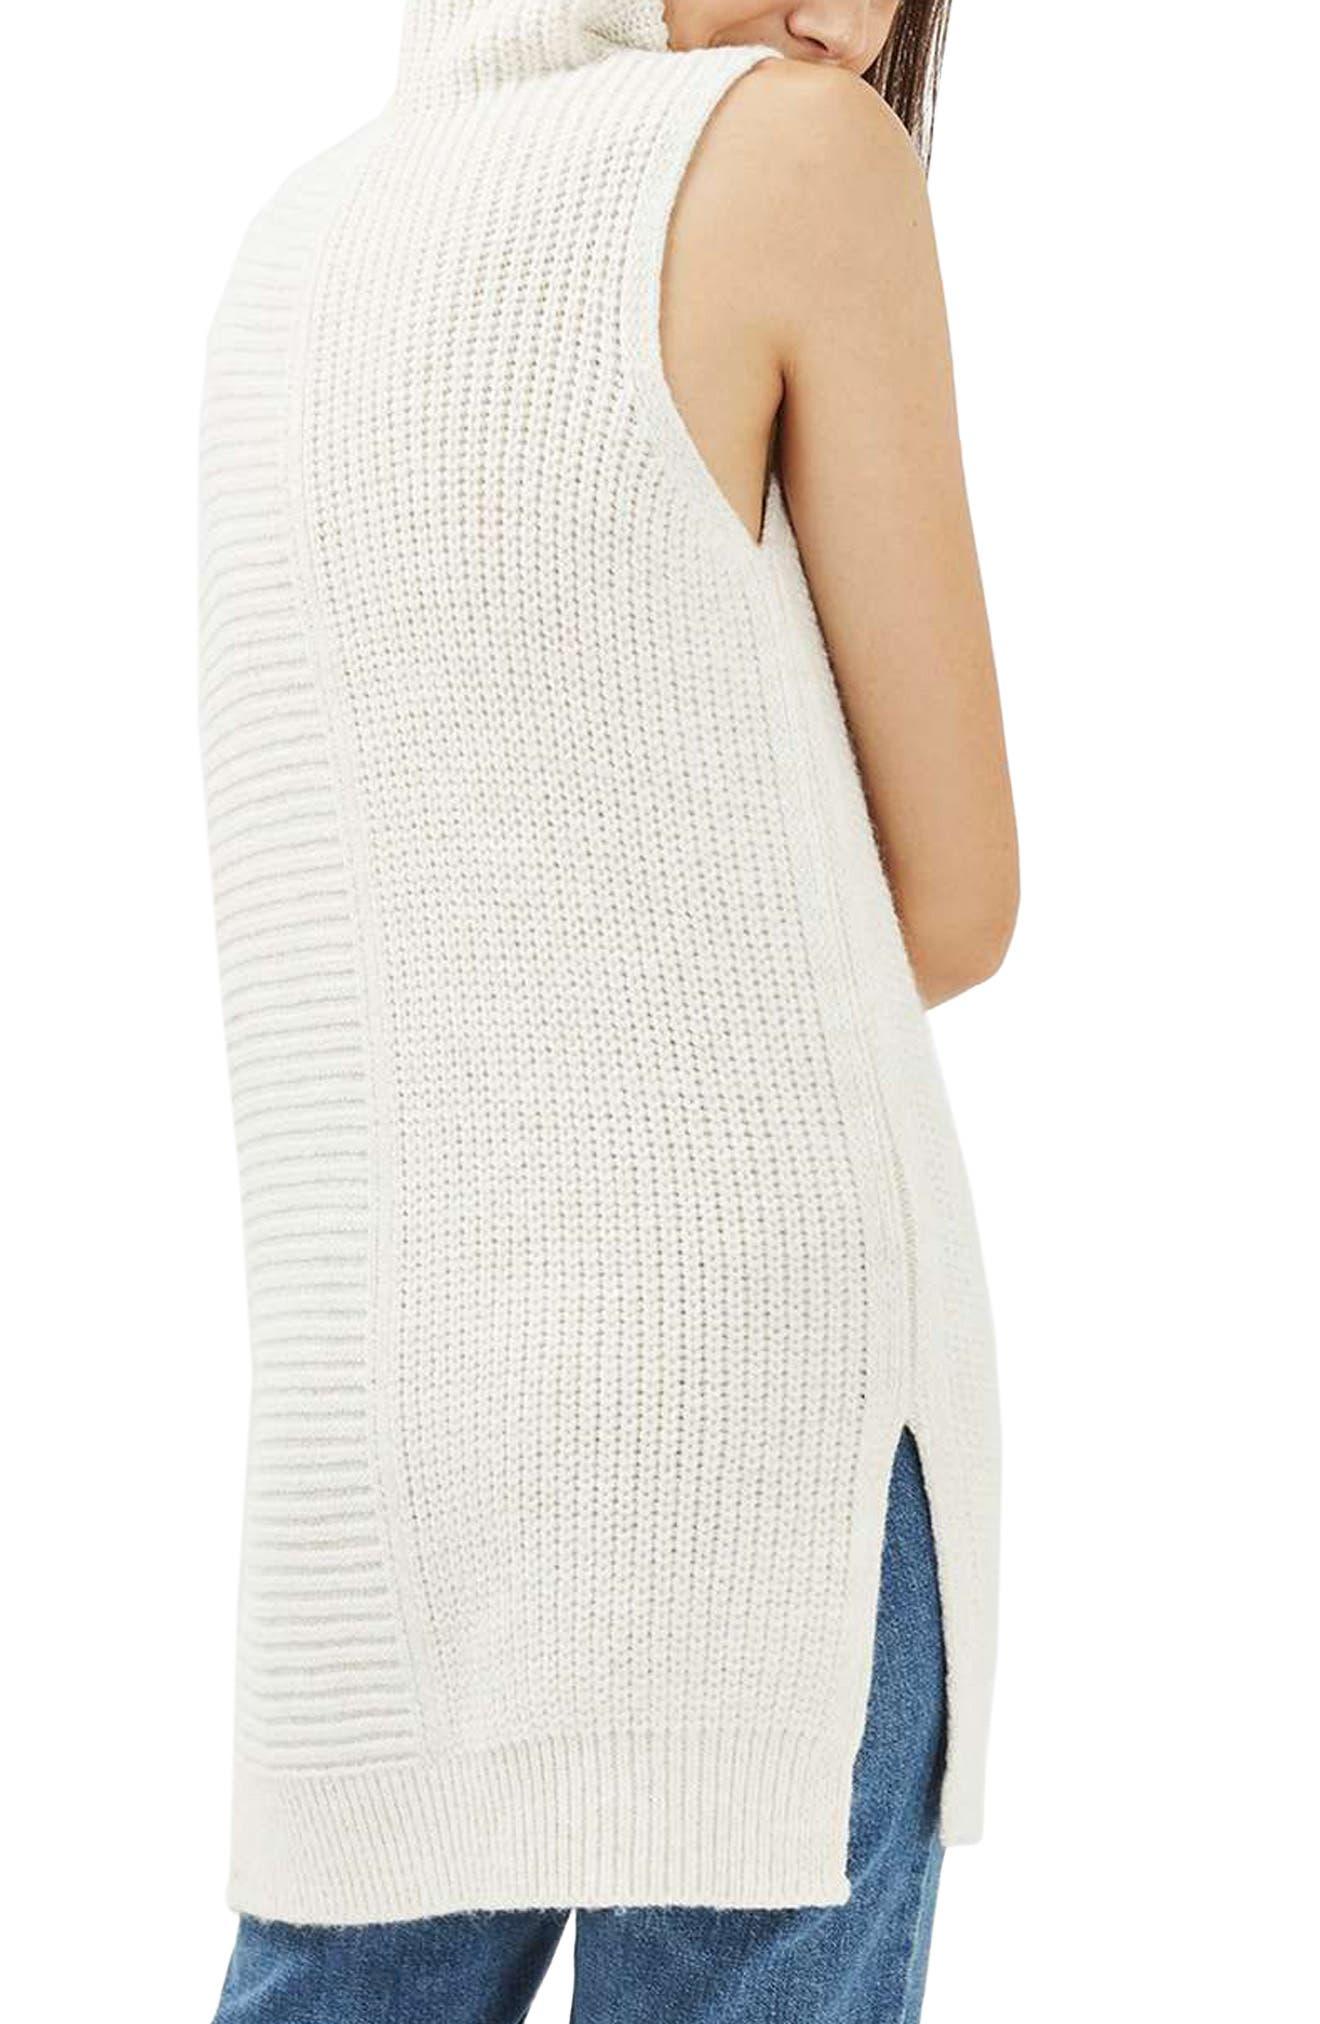 Sleeveless Turtleneck Sweater,                             Alternate thumbnail 2, color,                             900